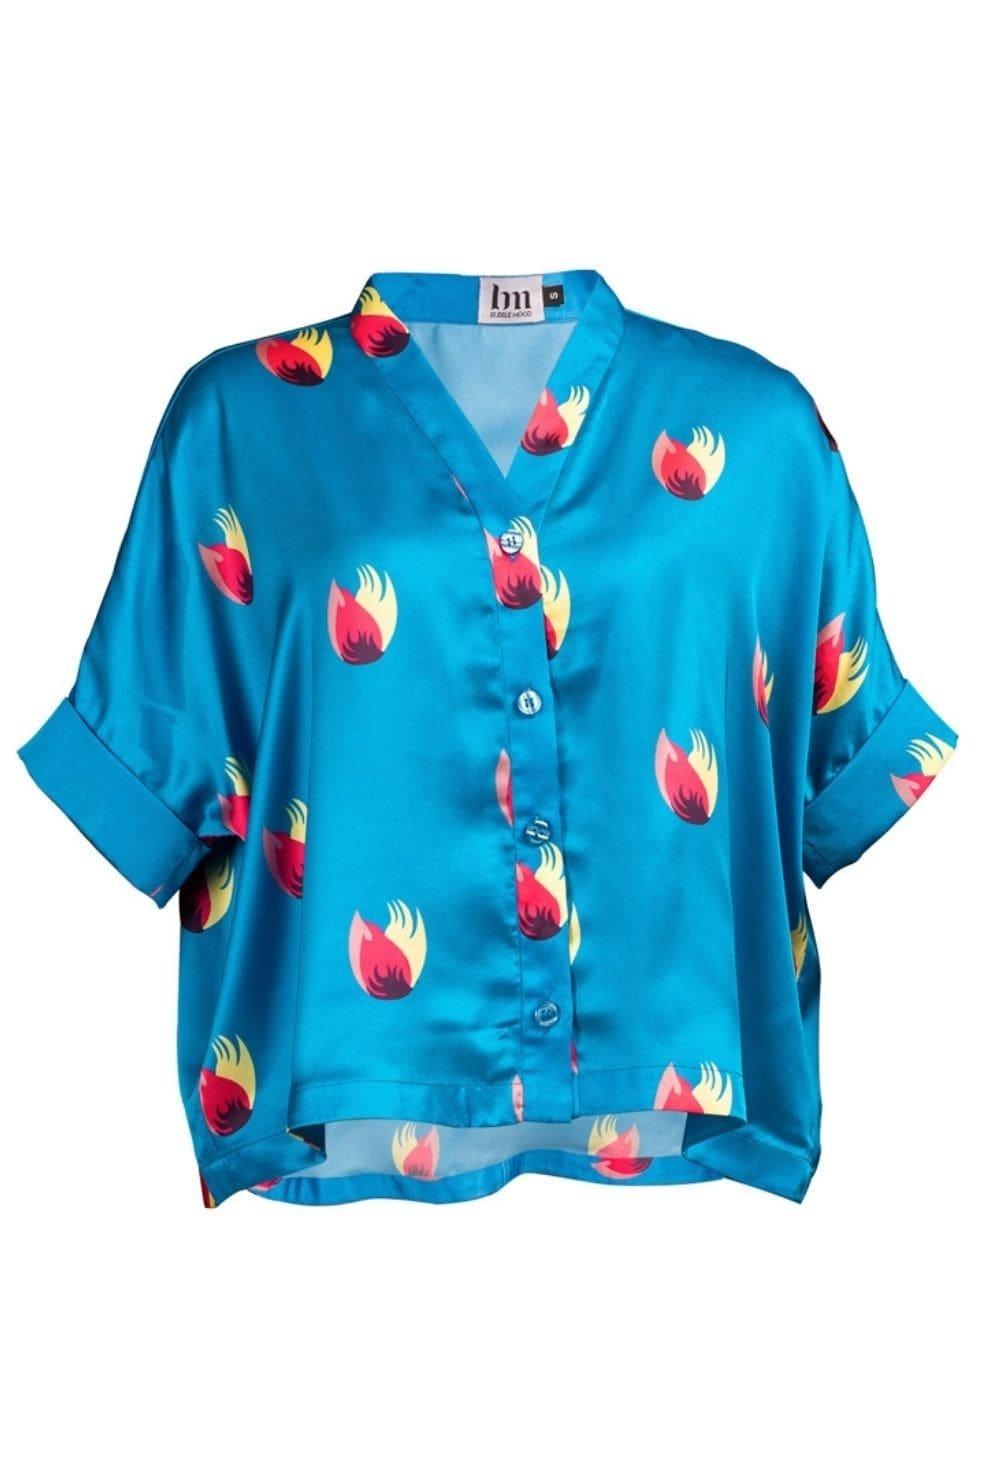 Chemise Bali bleu